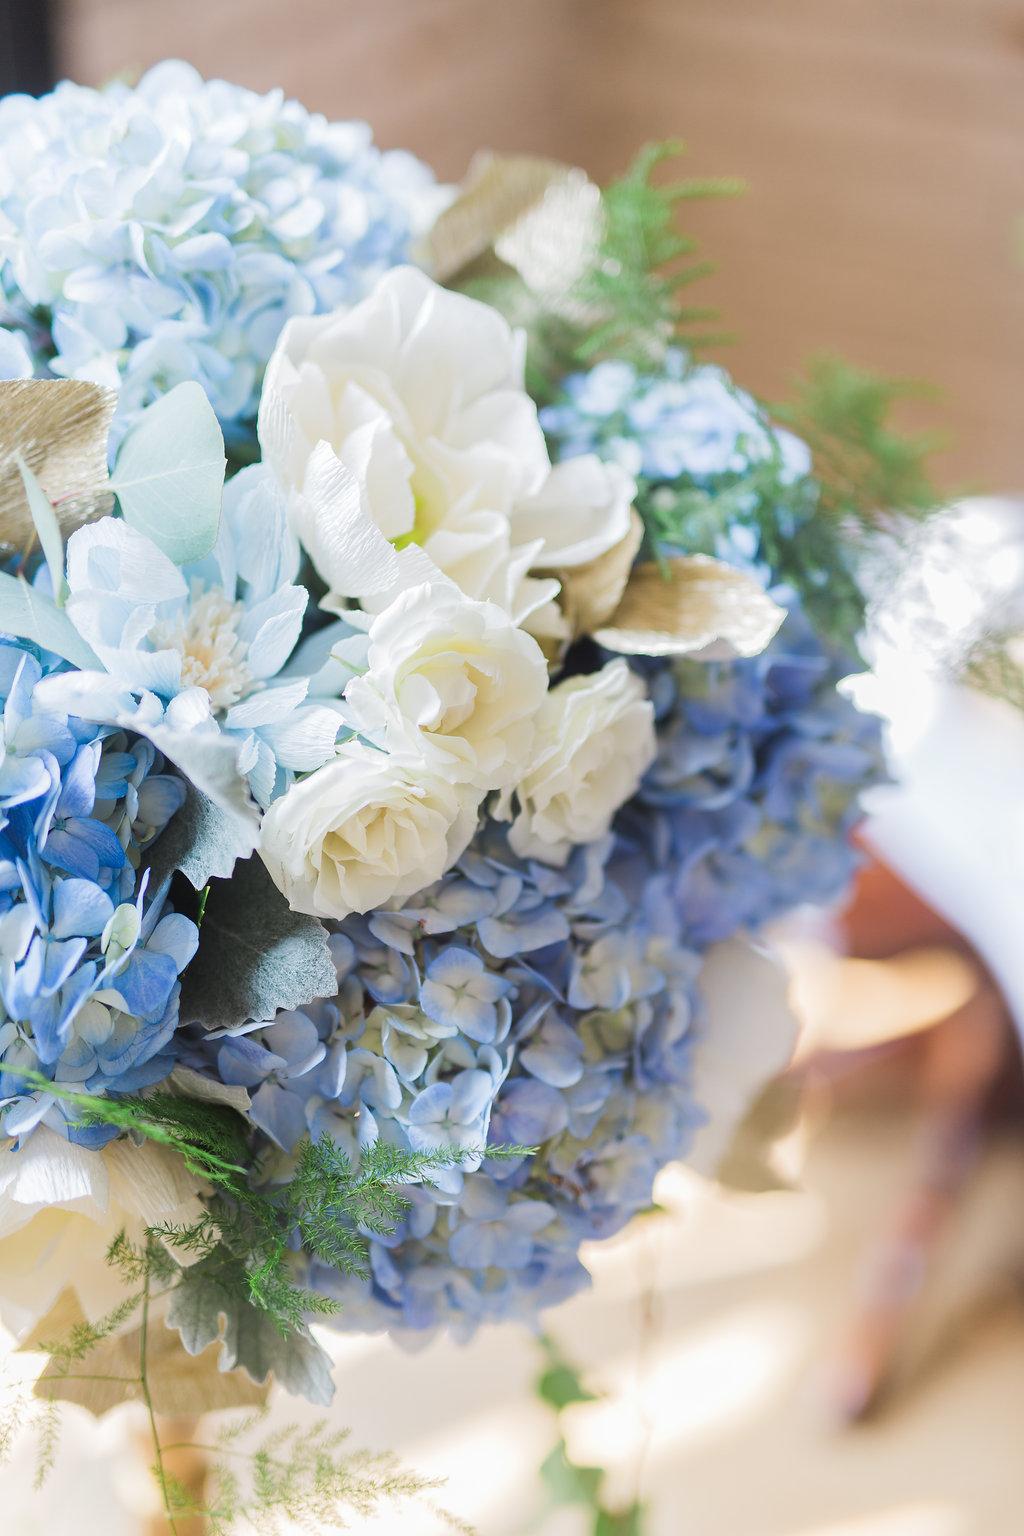 Phoebe Lo Events Toronto Wedding - Storys Building Urban Loft Paper Inspired Wedding 014.jpg